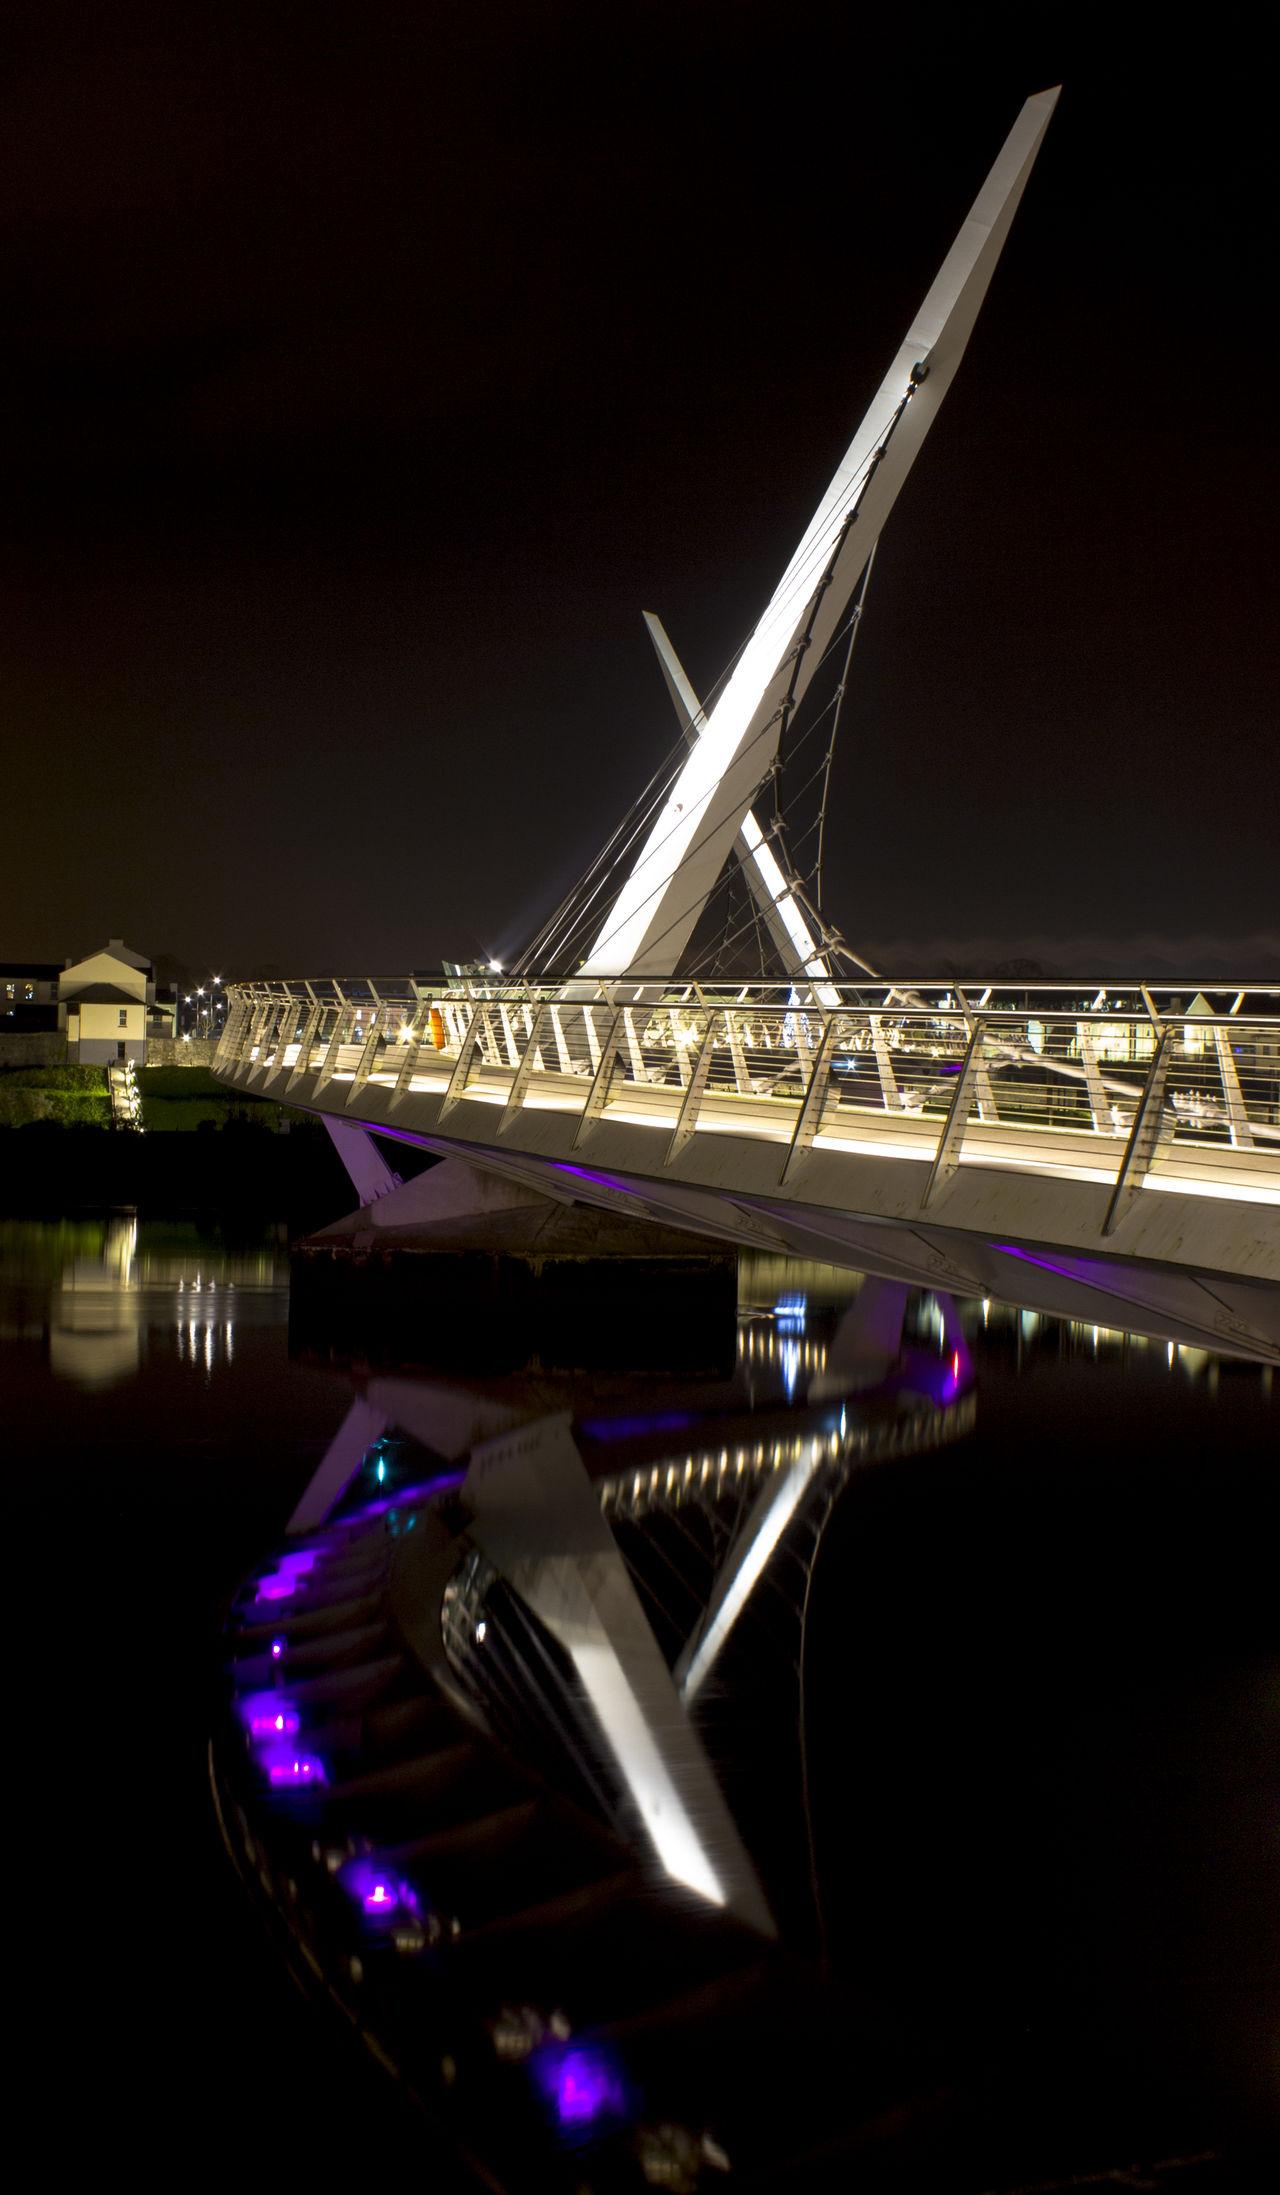 Peace Bridge at Night City Derrylondonderry Ireland Nightphotography Outdoors Peace Bridge Tourism Water Reflections